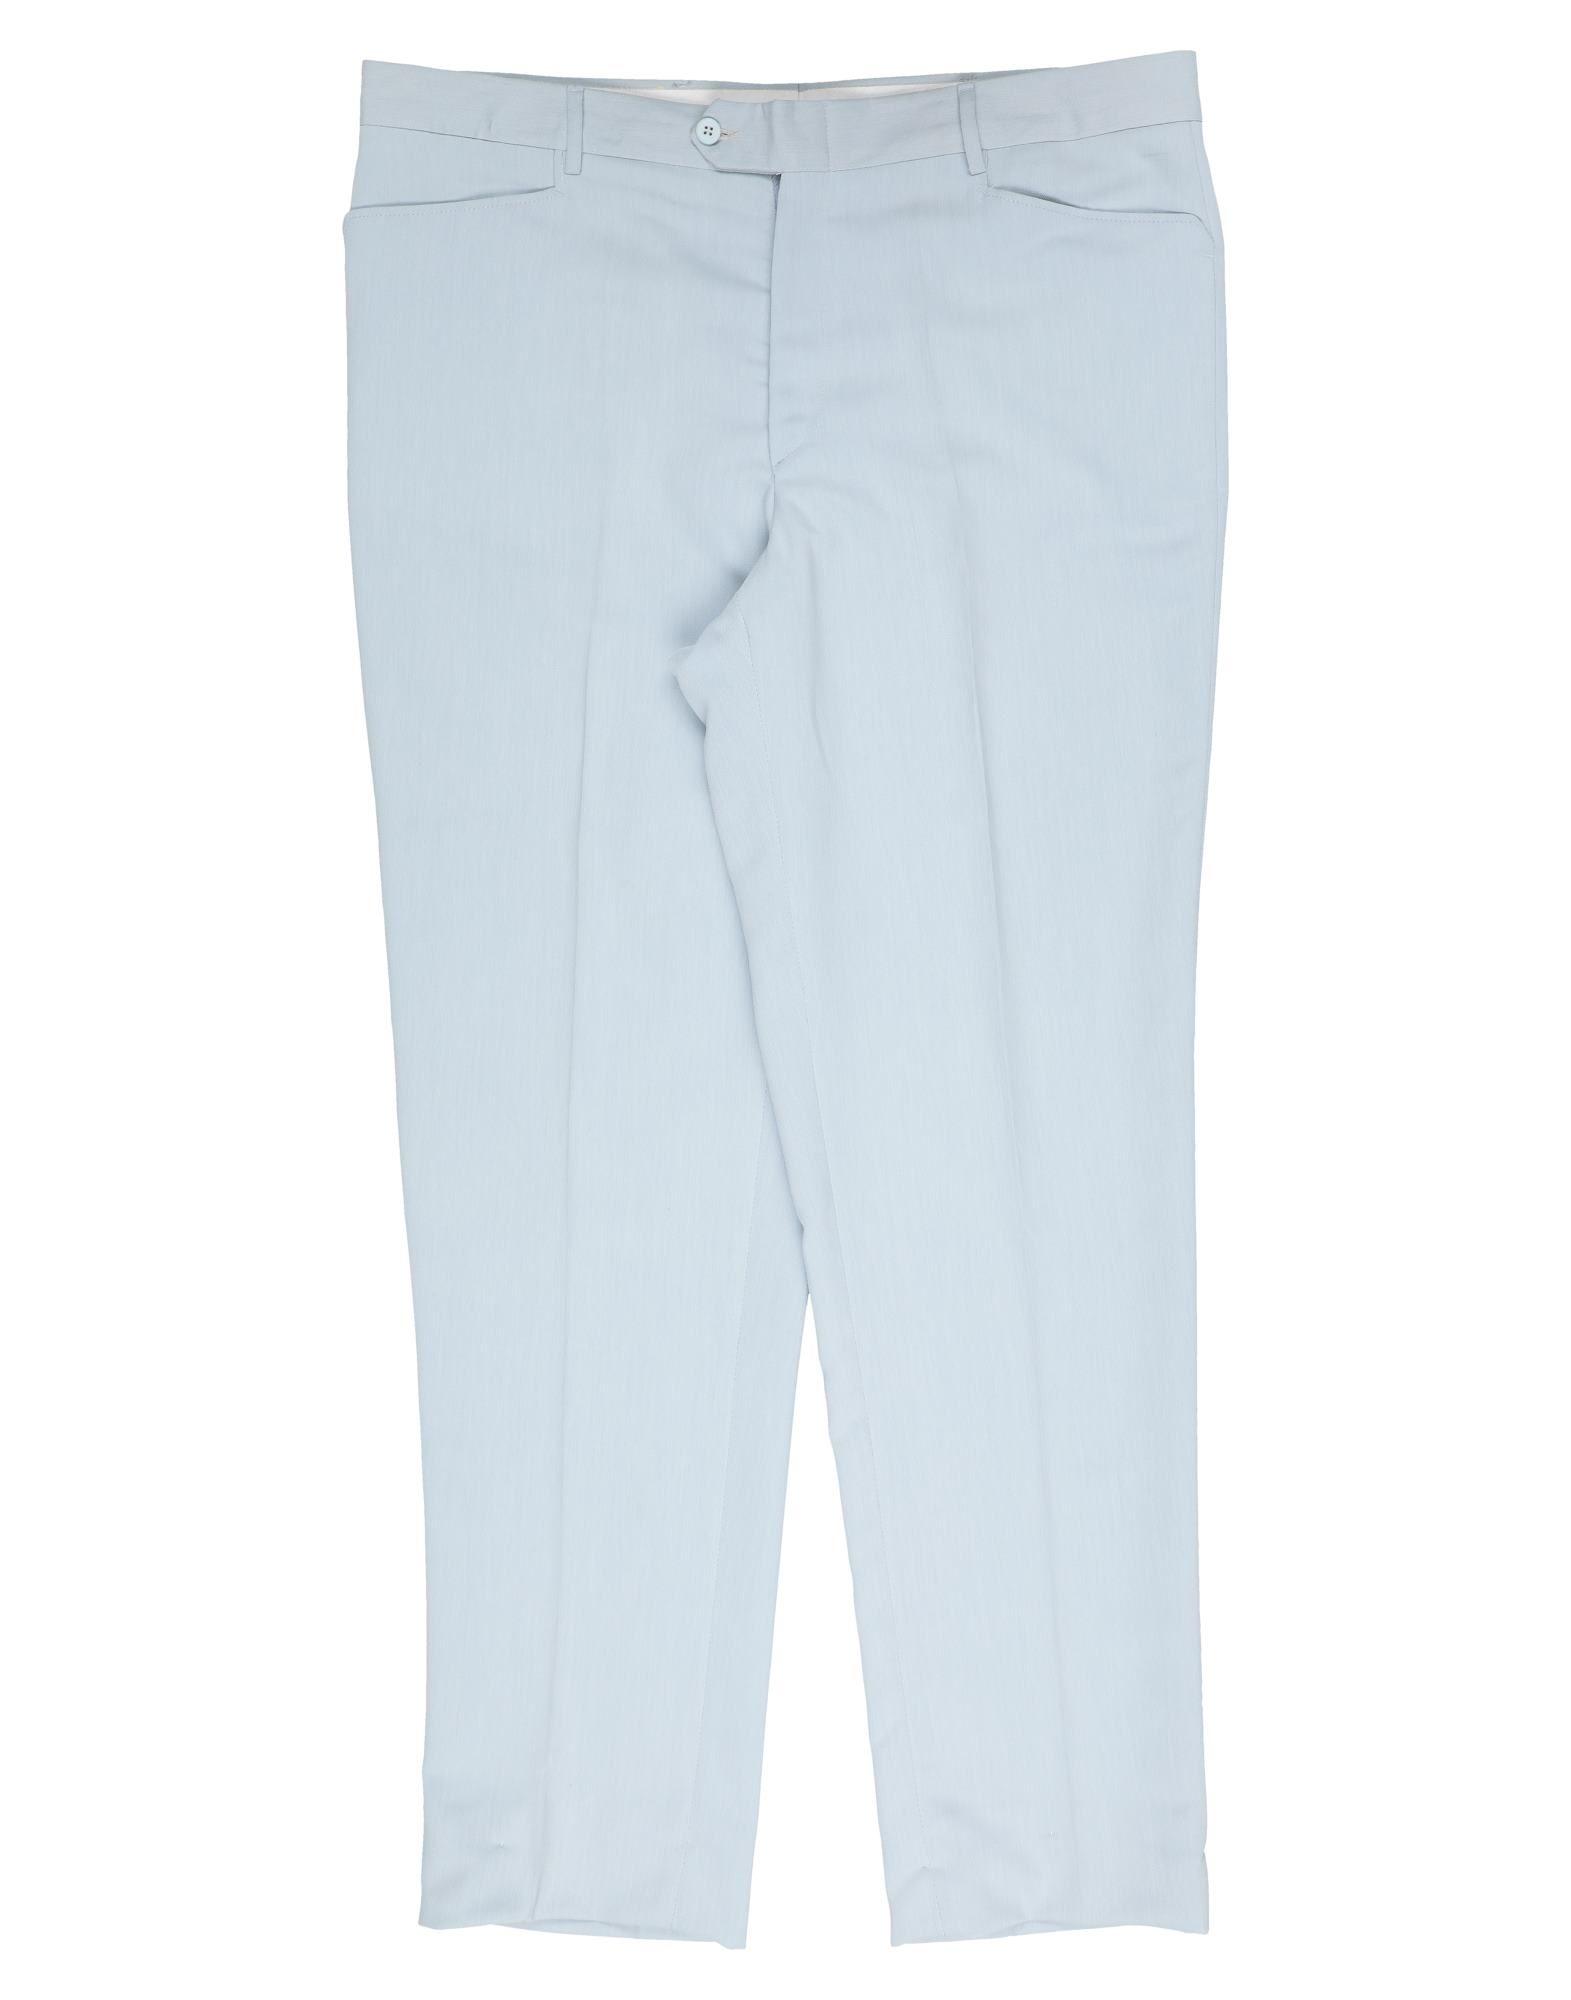 SPREAD HOMME PLUS Повседневные брюки